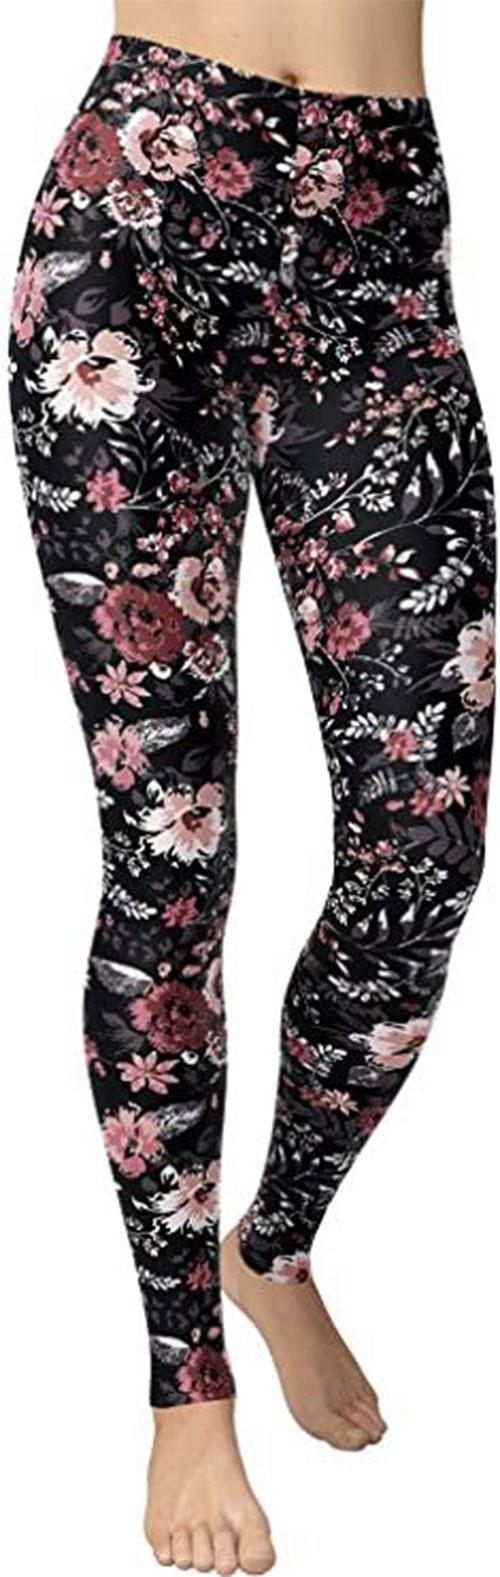 Floral-Print-Pants-For-Girls-Women-2021-Spring-Fashion-2